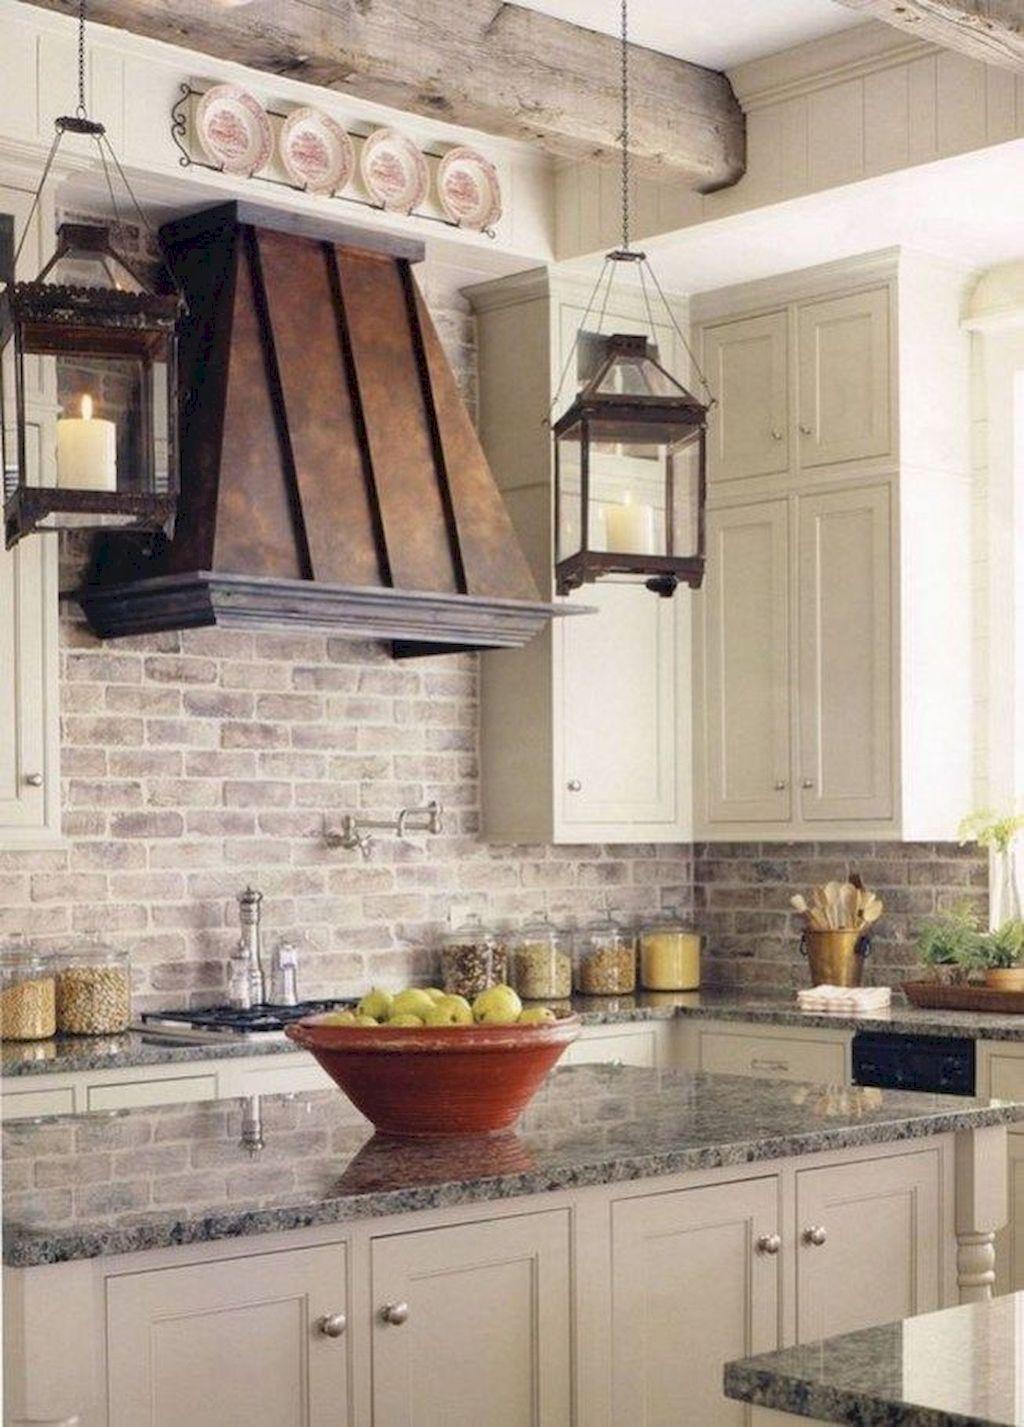 45 Farmhouse Kitchen Backsplash Design Ideas My Future Home In